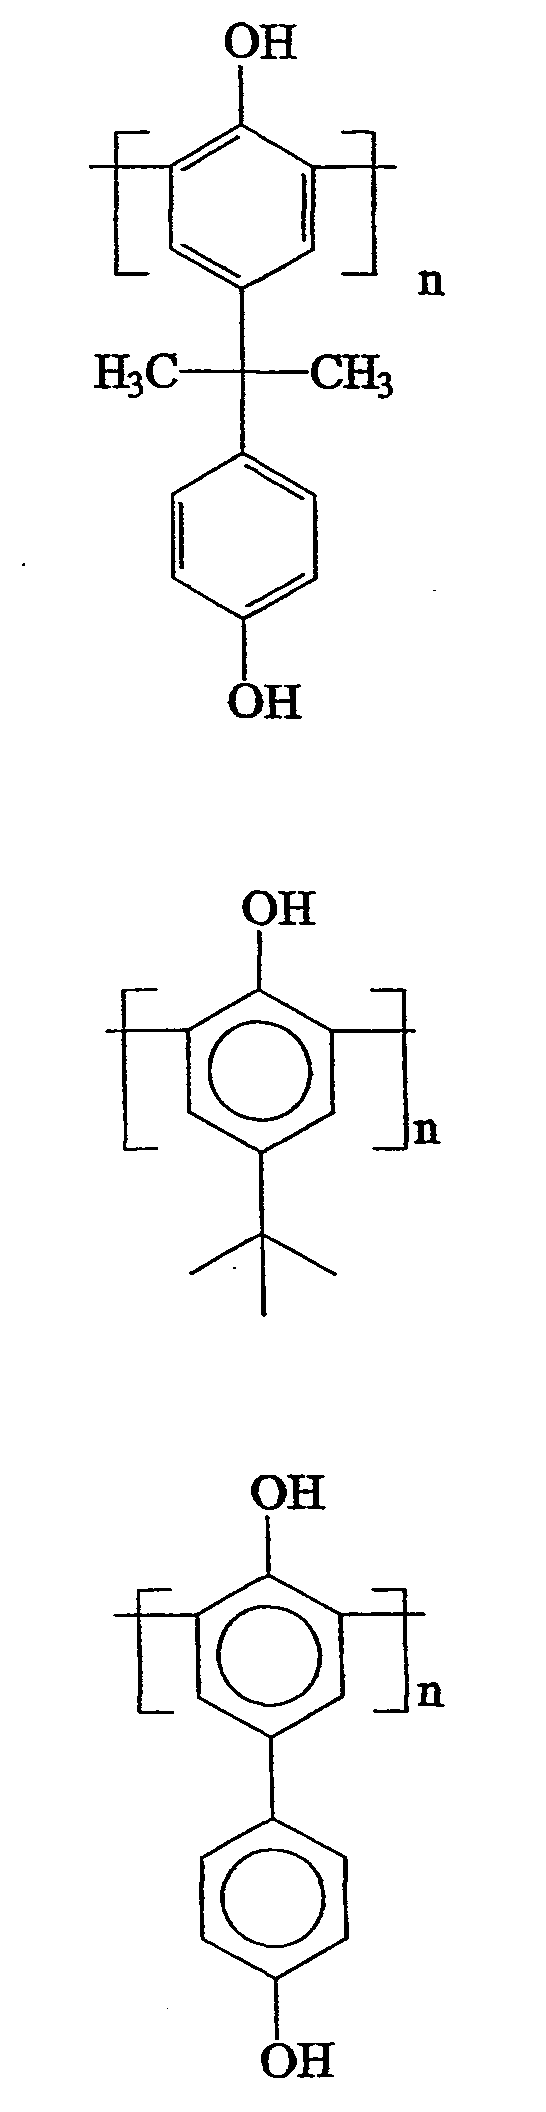 Figure 112003007601304-pct00001